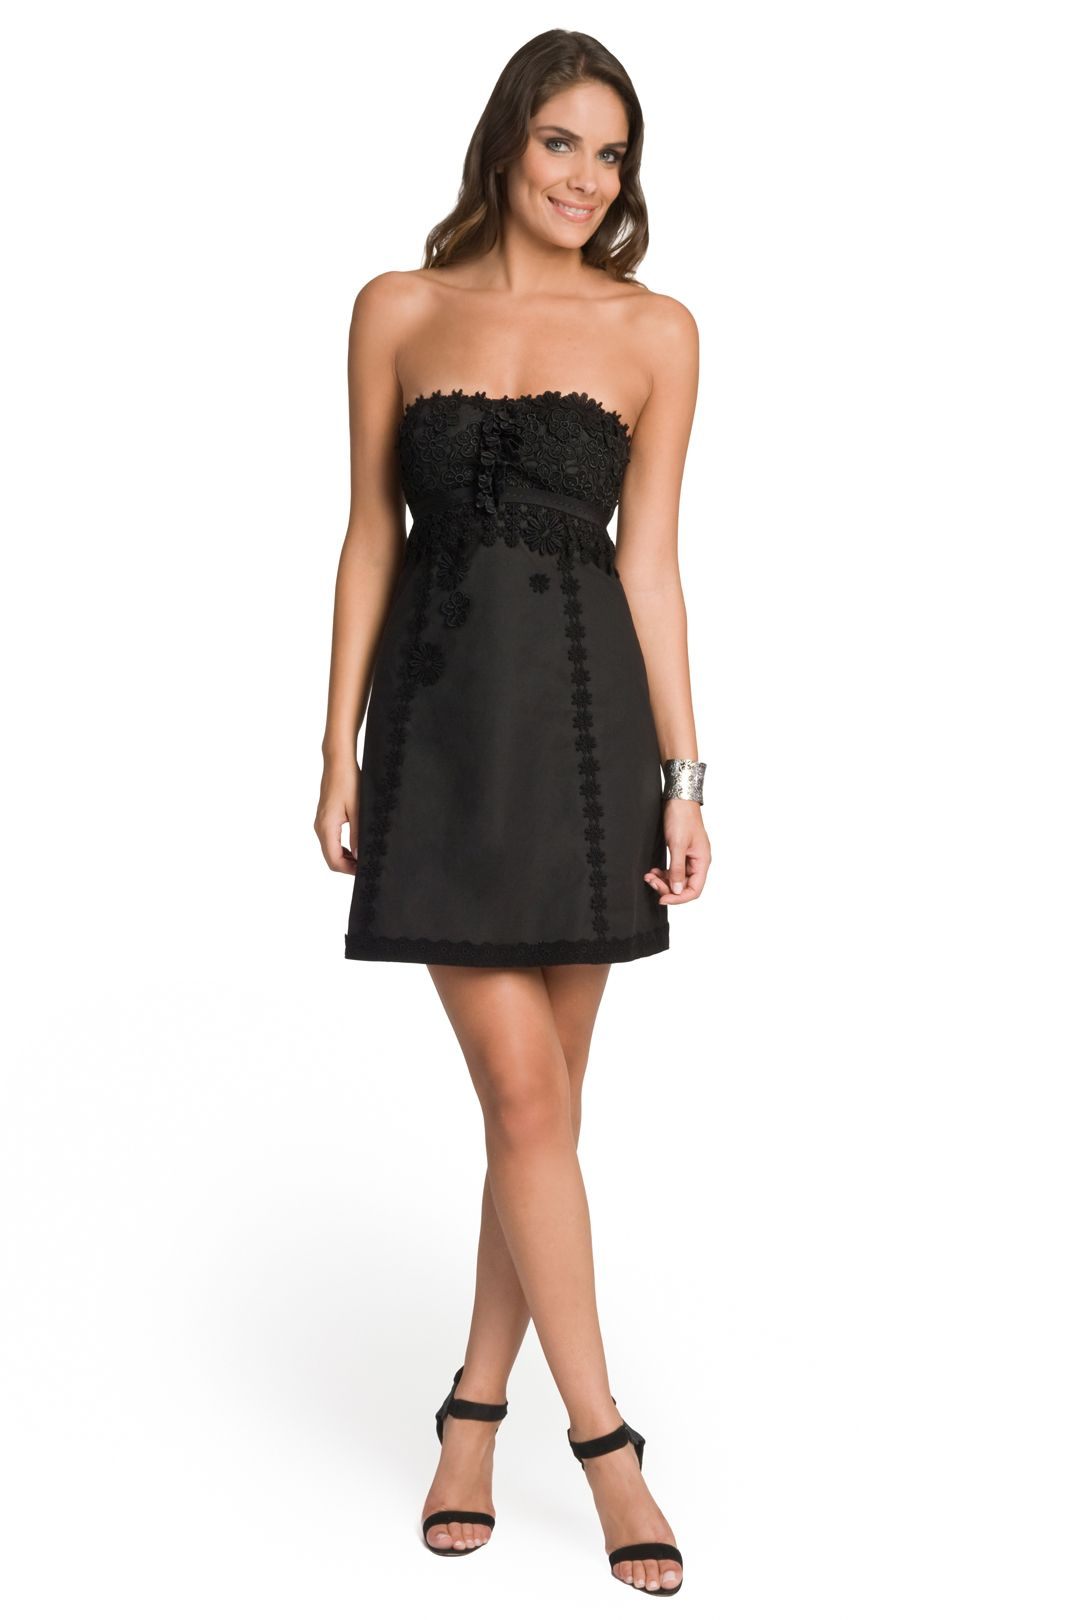 Moschino Cheap And Chic Embellished Strapless Dress Summer Dress Trends Strapless Dresses Short Strapless Dress [ 1620 x 1080 Pixel ]